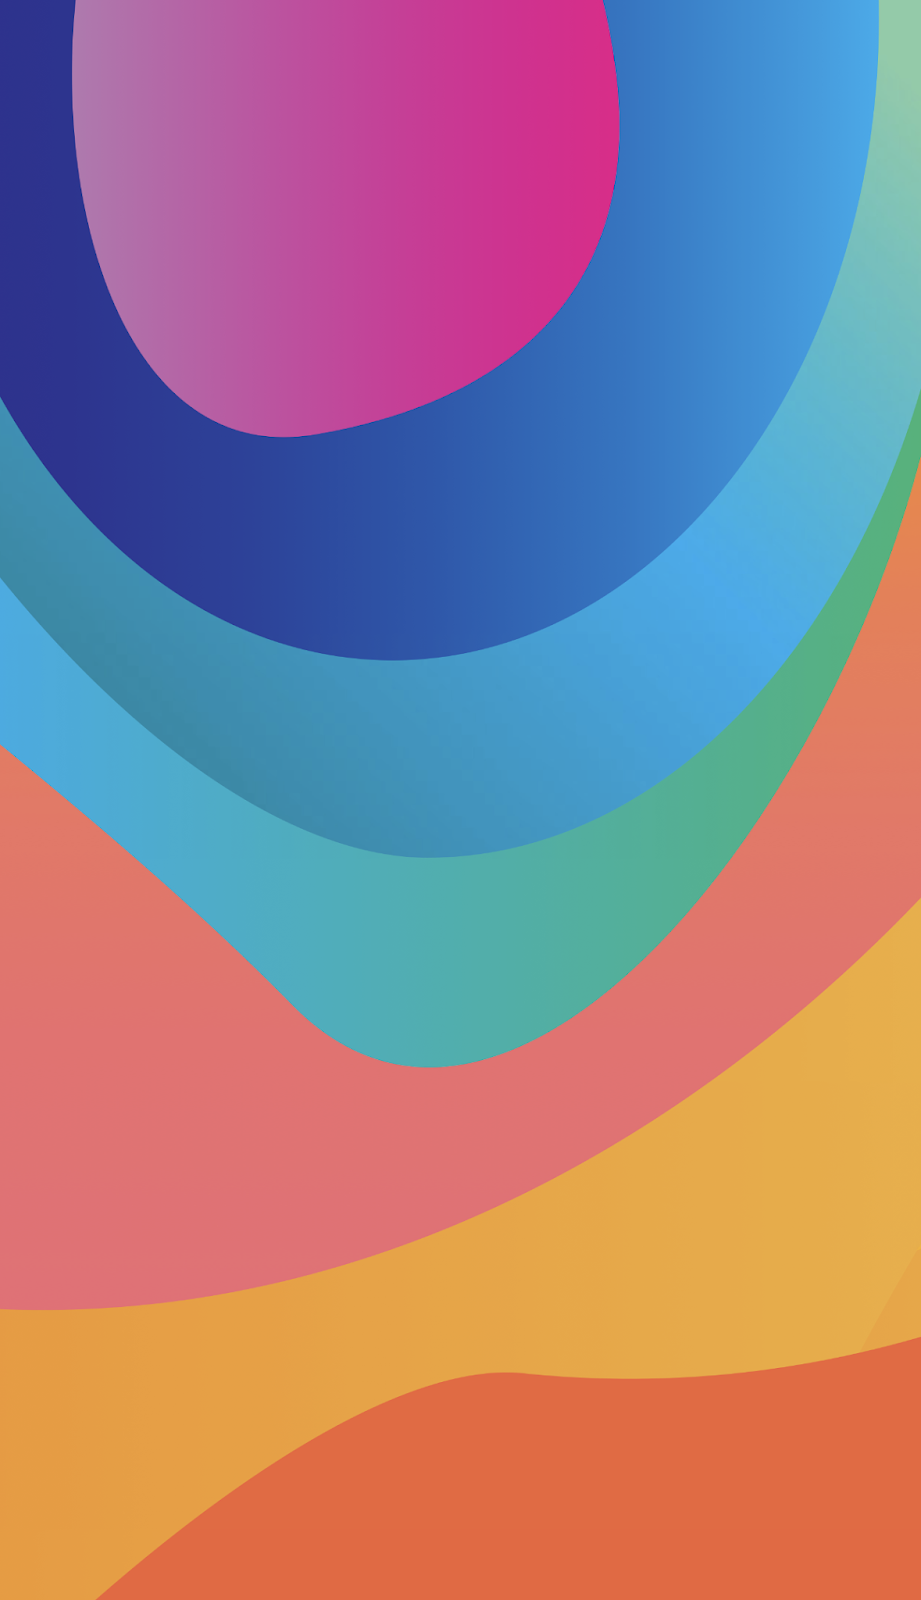 Come funziona 1.1.1.1 l'app di CloudFlare